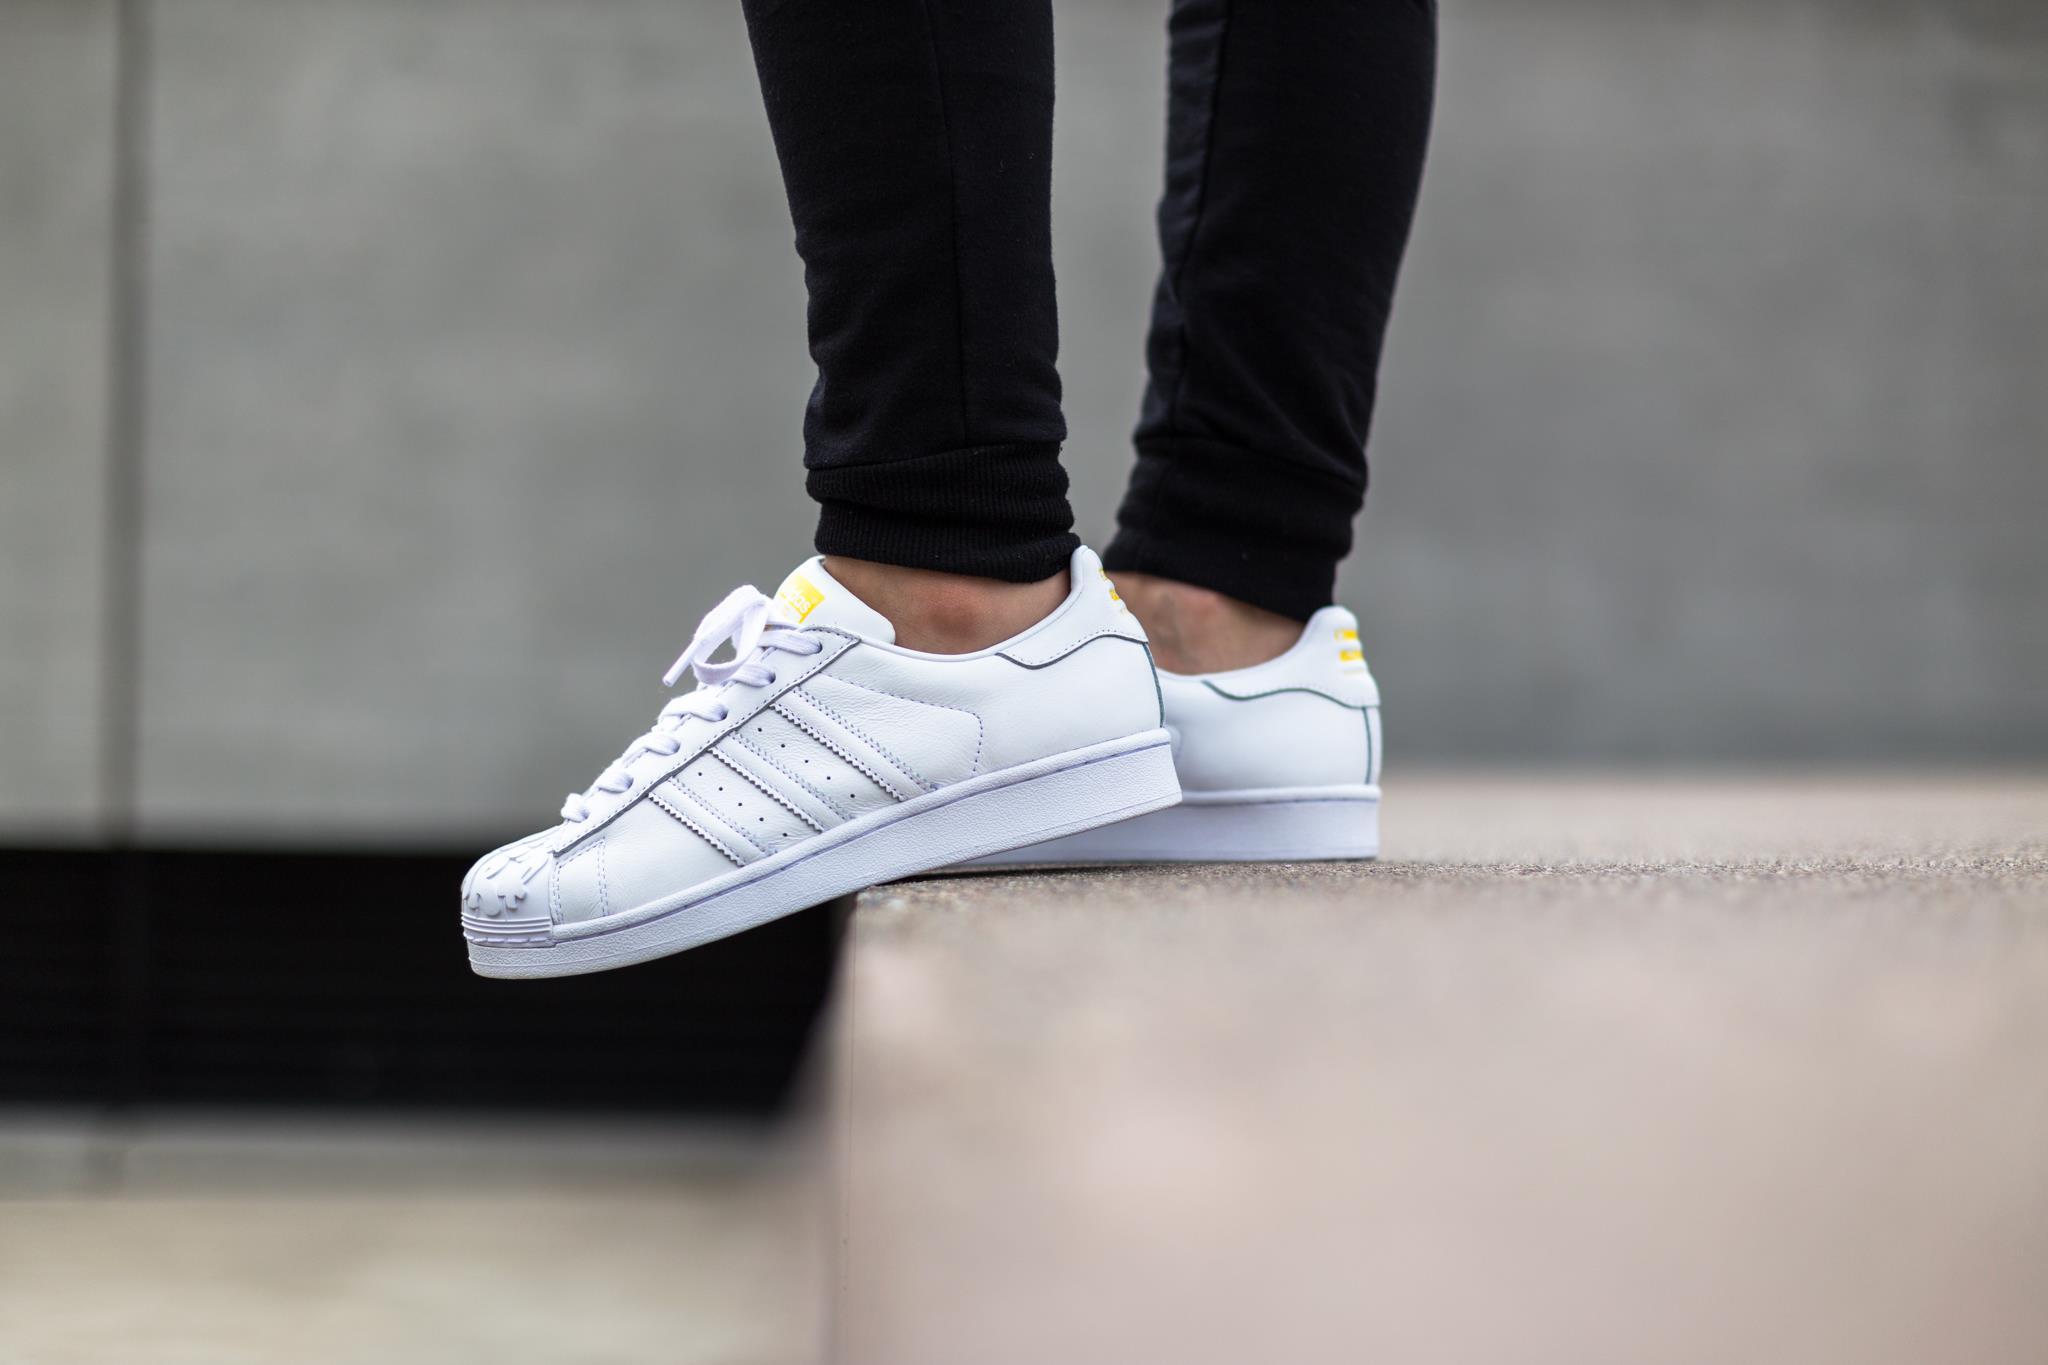 NEW ARRIVAL: The Todd James adidas Originals Superstar